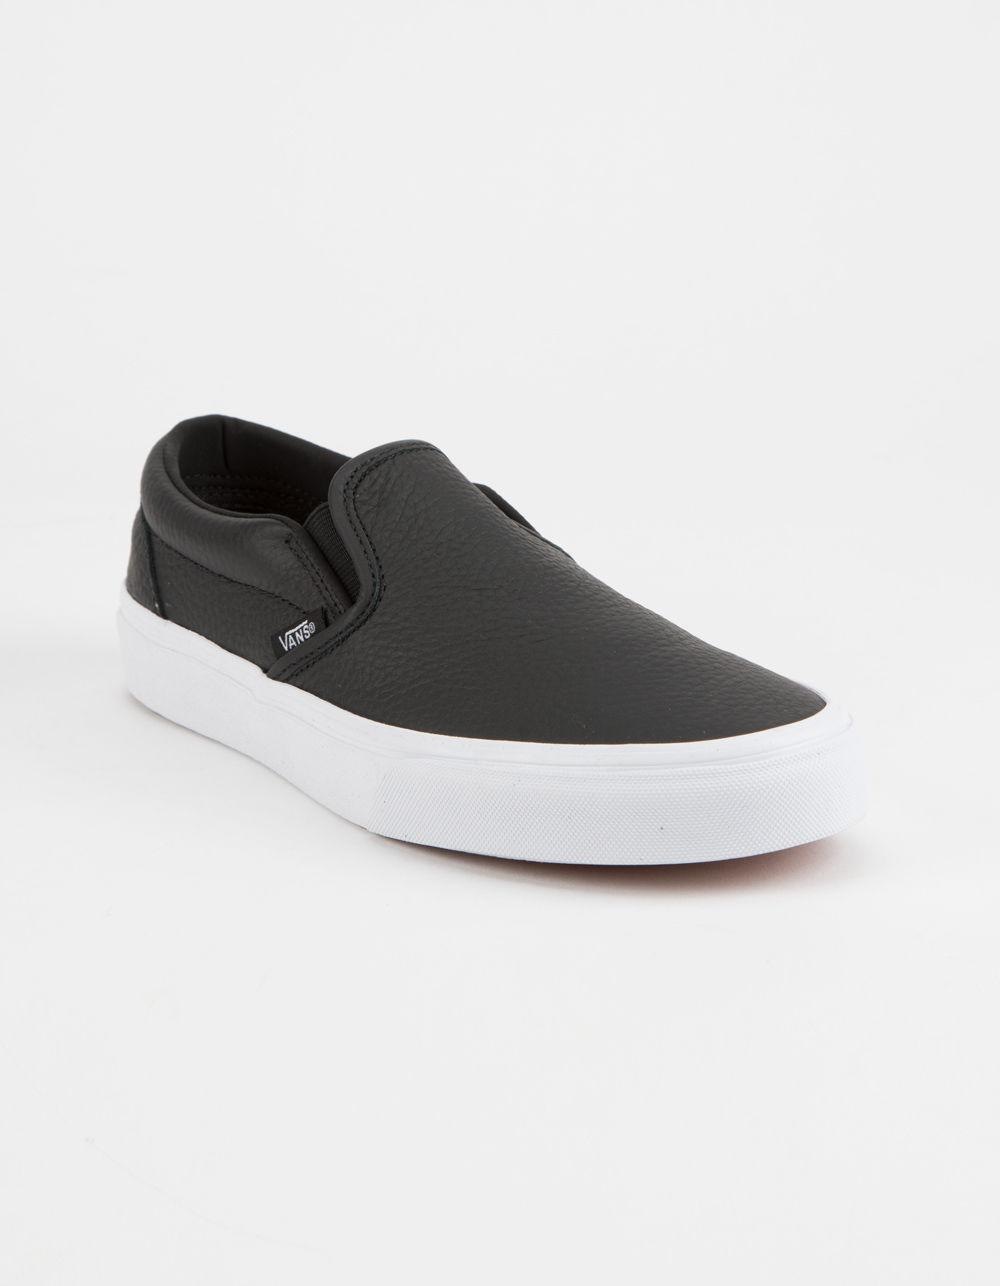 957bcac8de7 Tumble Leather Black & True White Classic Slip-on Womens Shoes